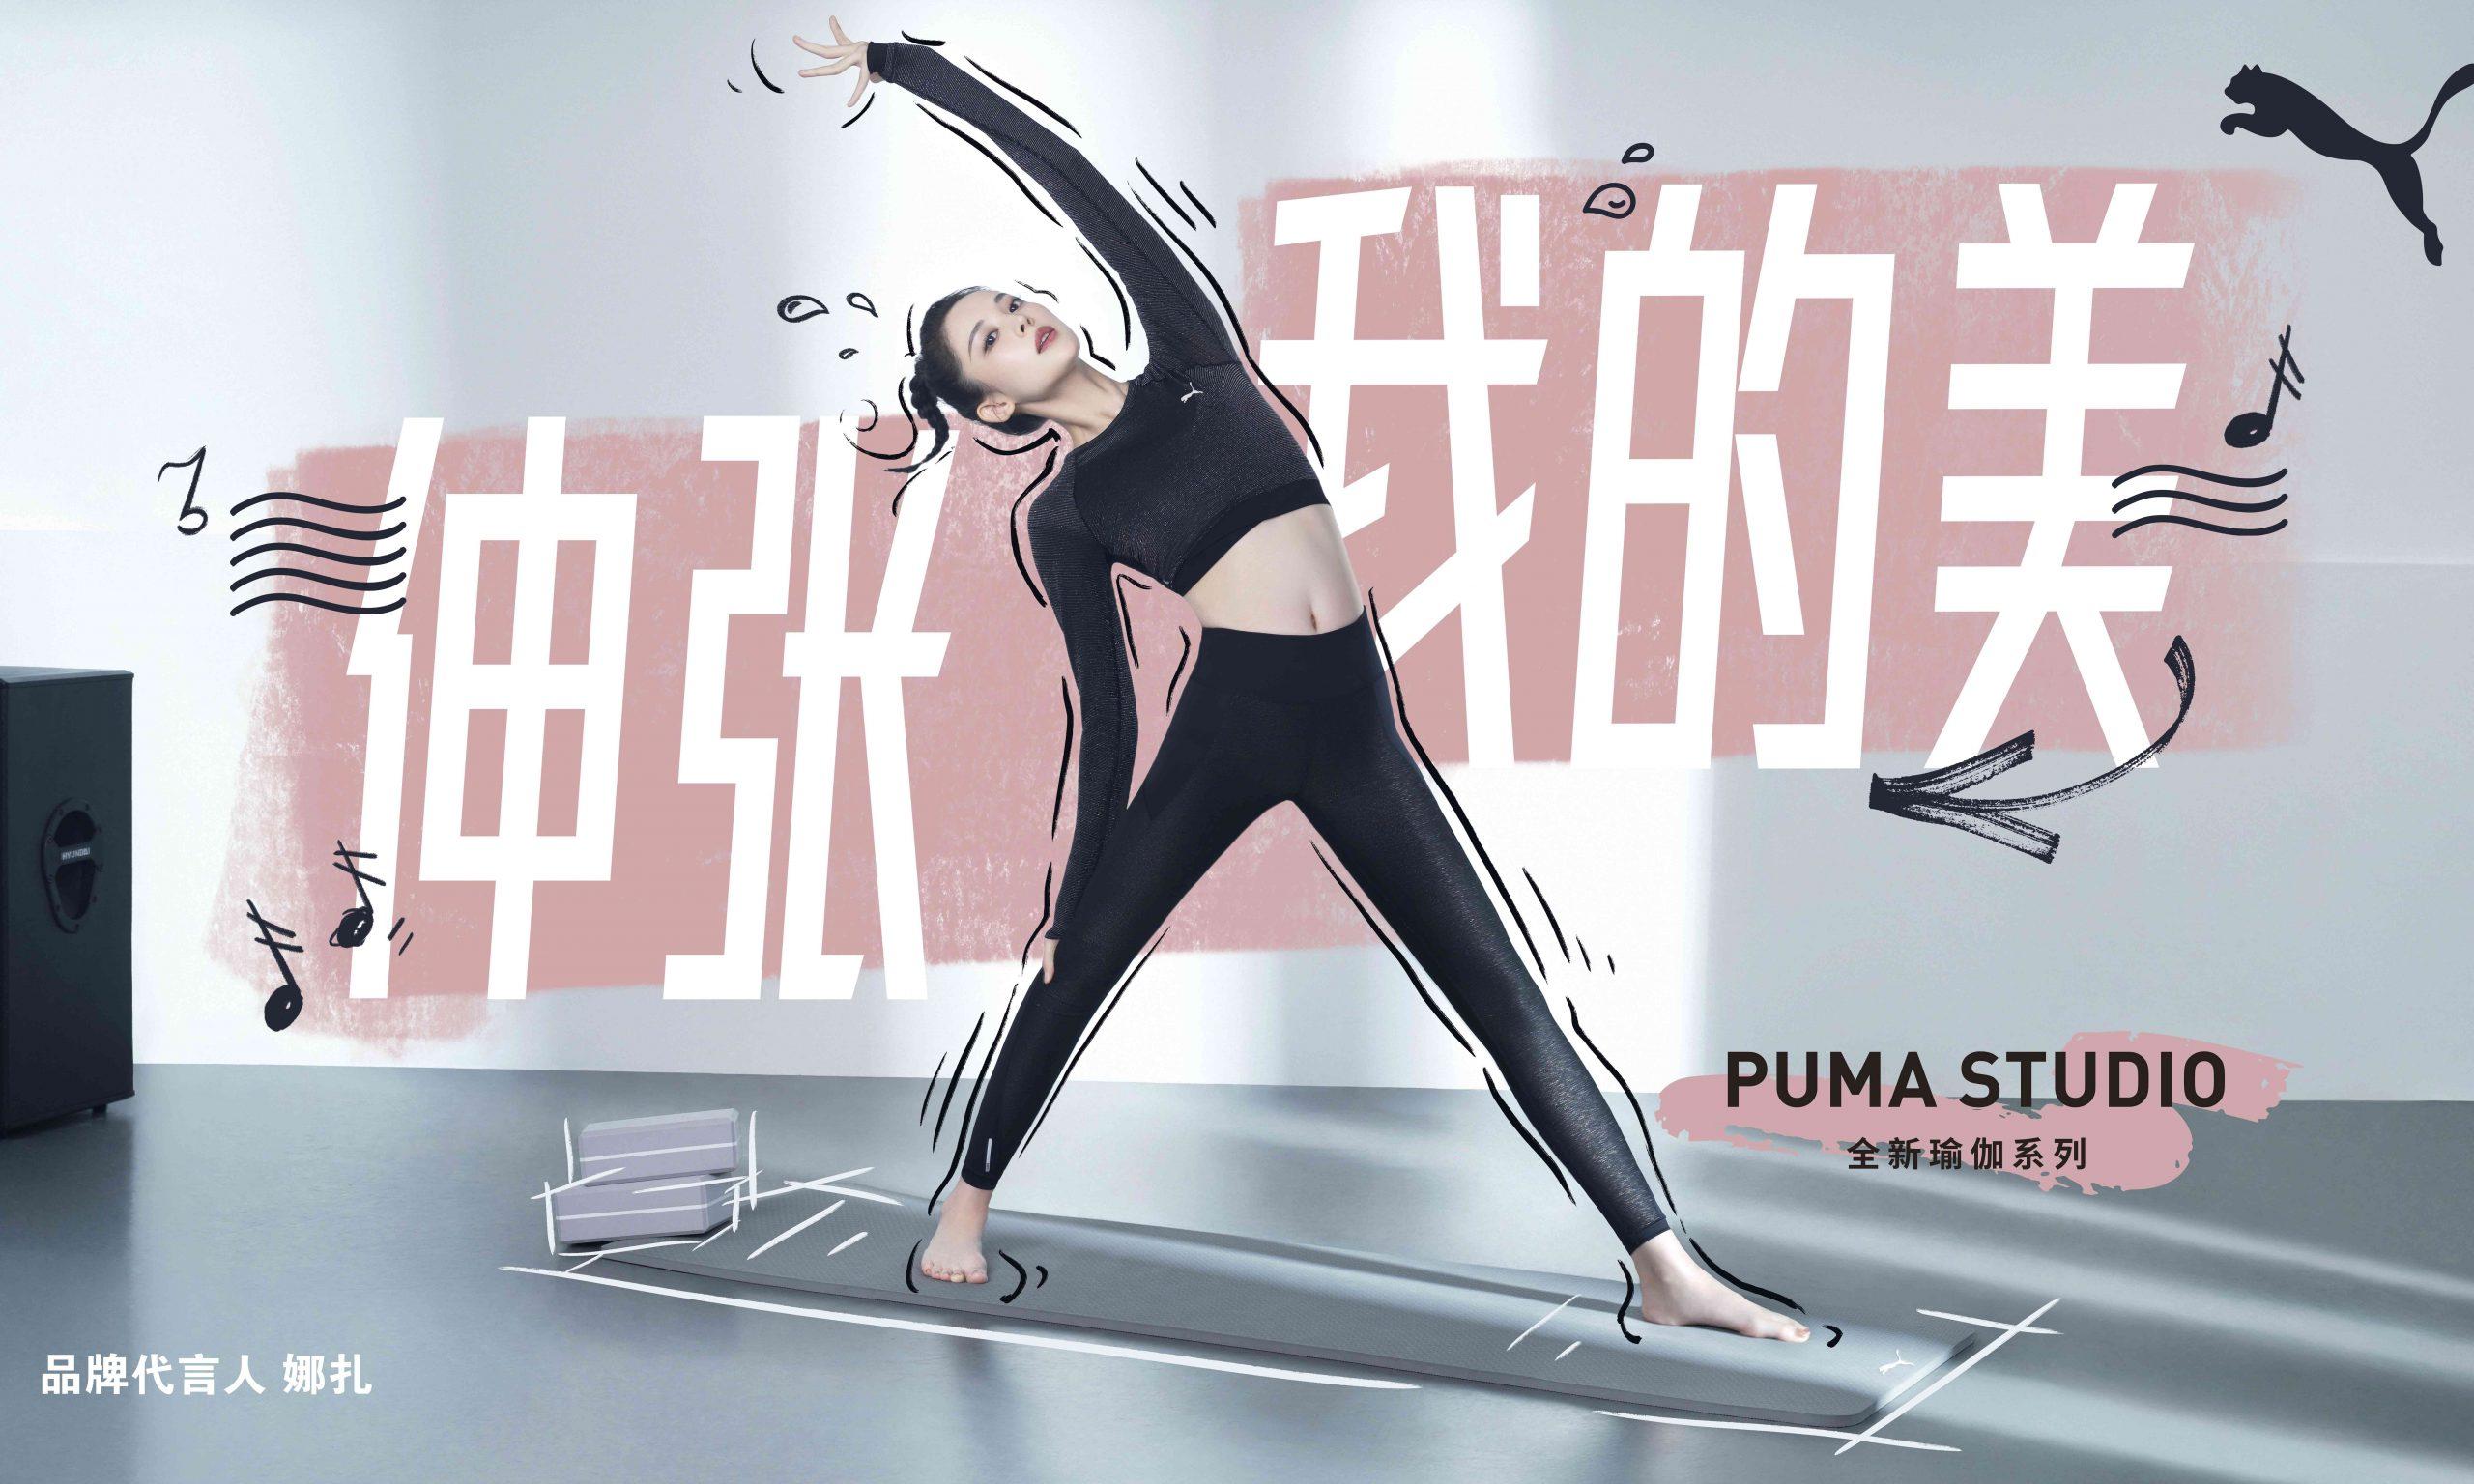 PUMA 推出全新 PUMA STUDIO 瑜伽系列产品